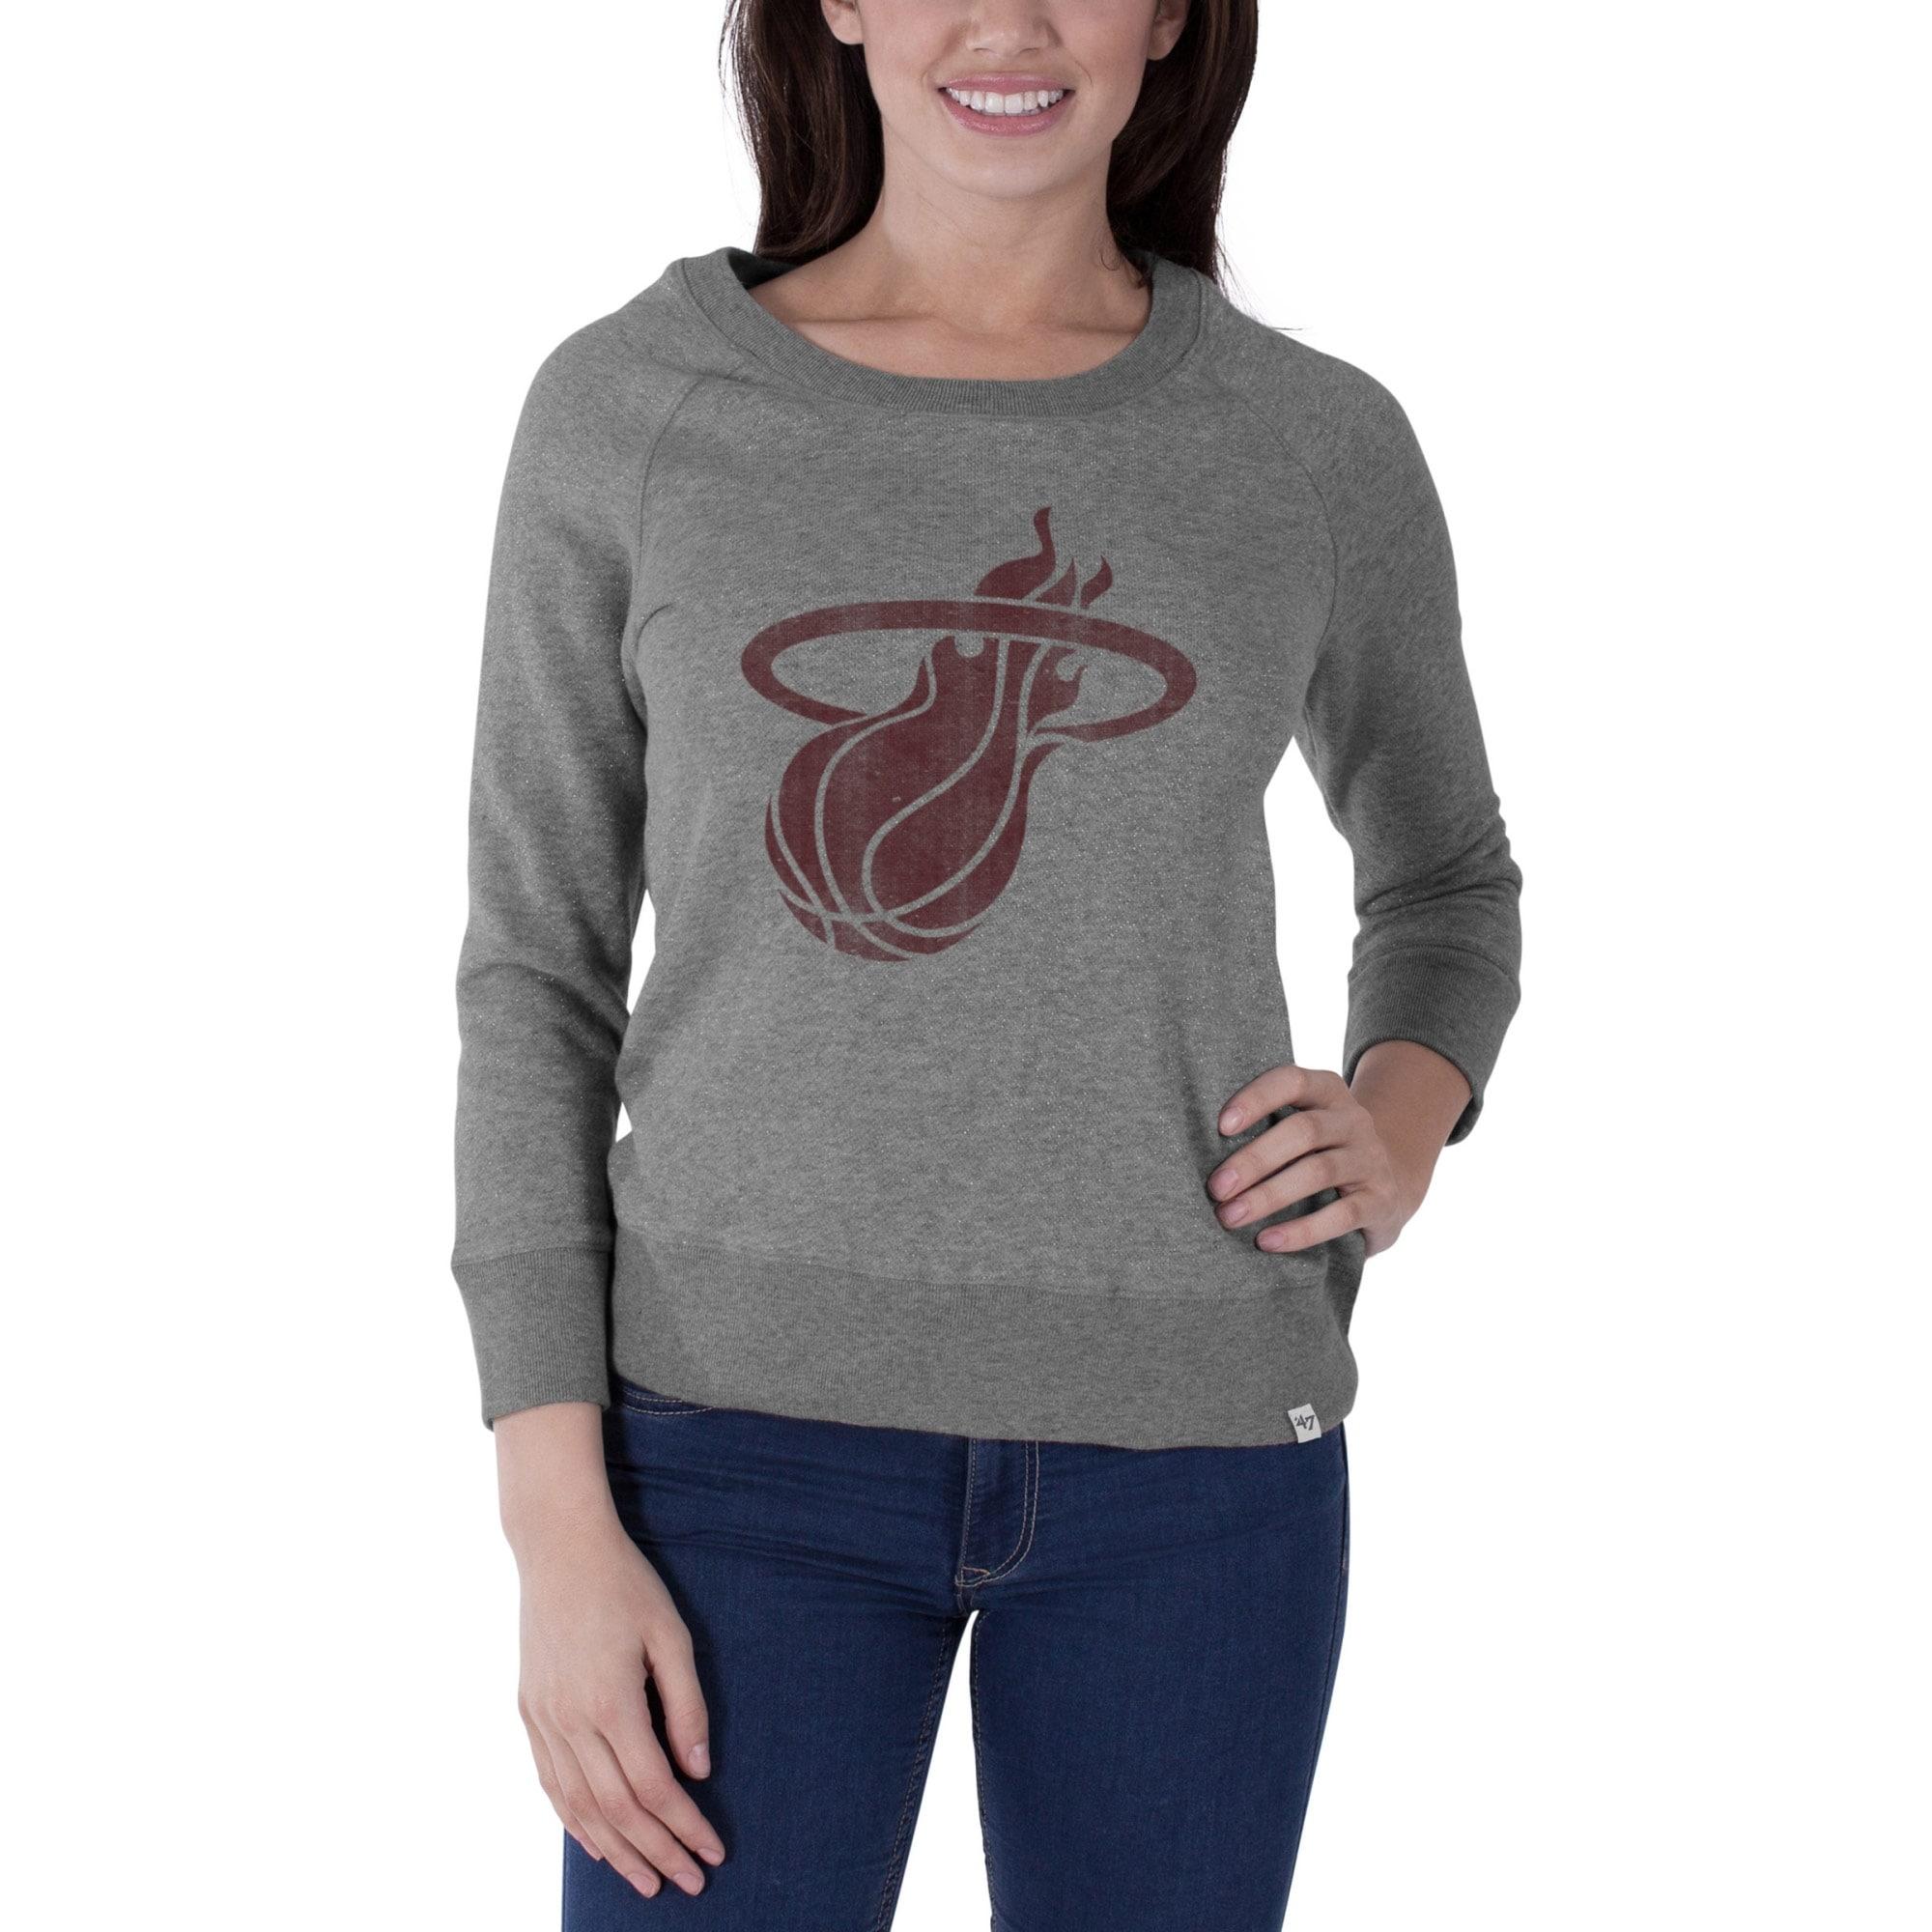 Miami Heat '47 Brand Women's Glimmer Crew Tri-Blend Sweatshirt - Gray